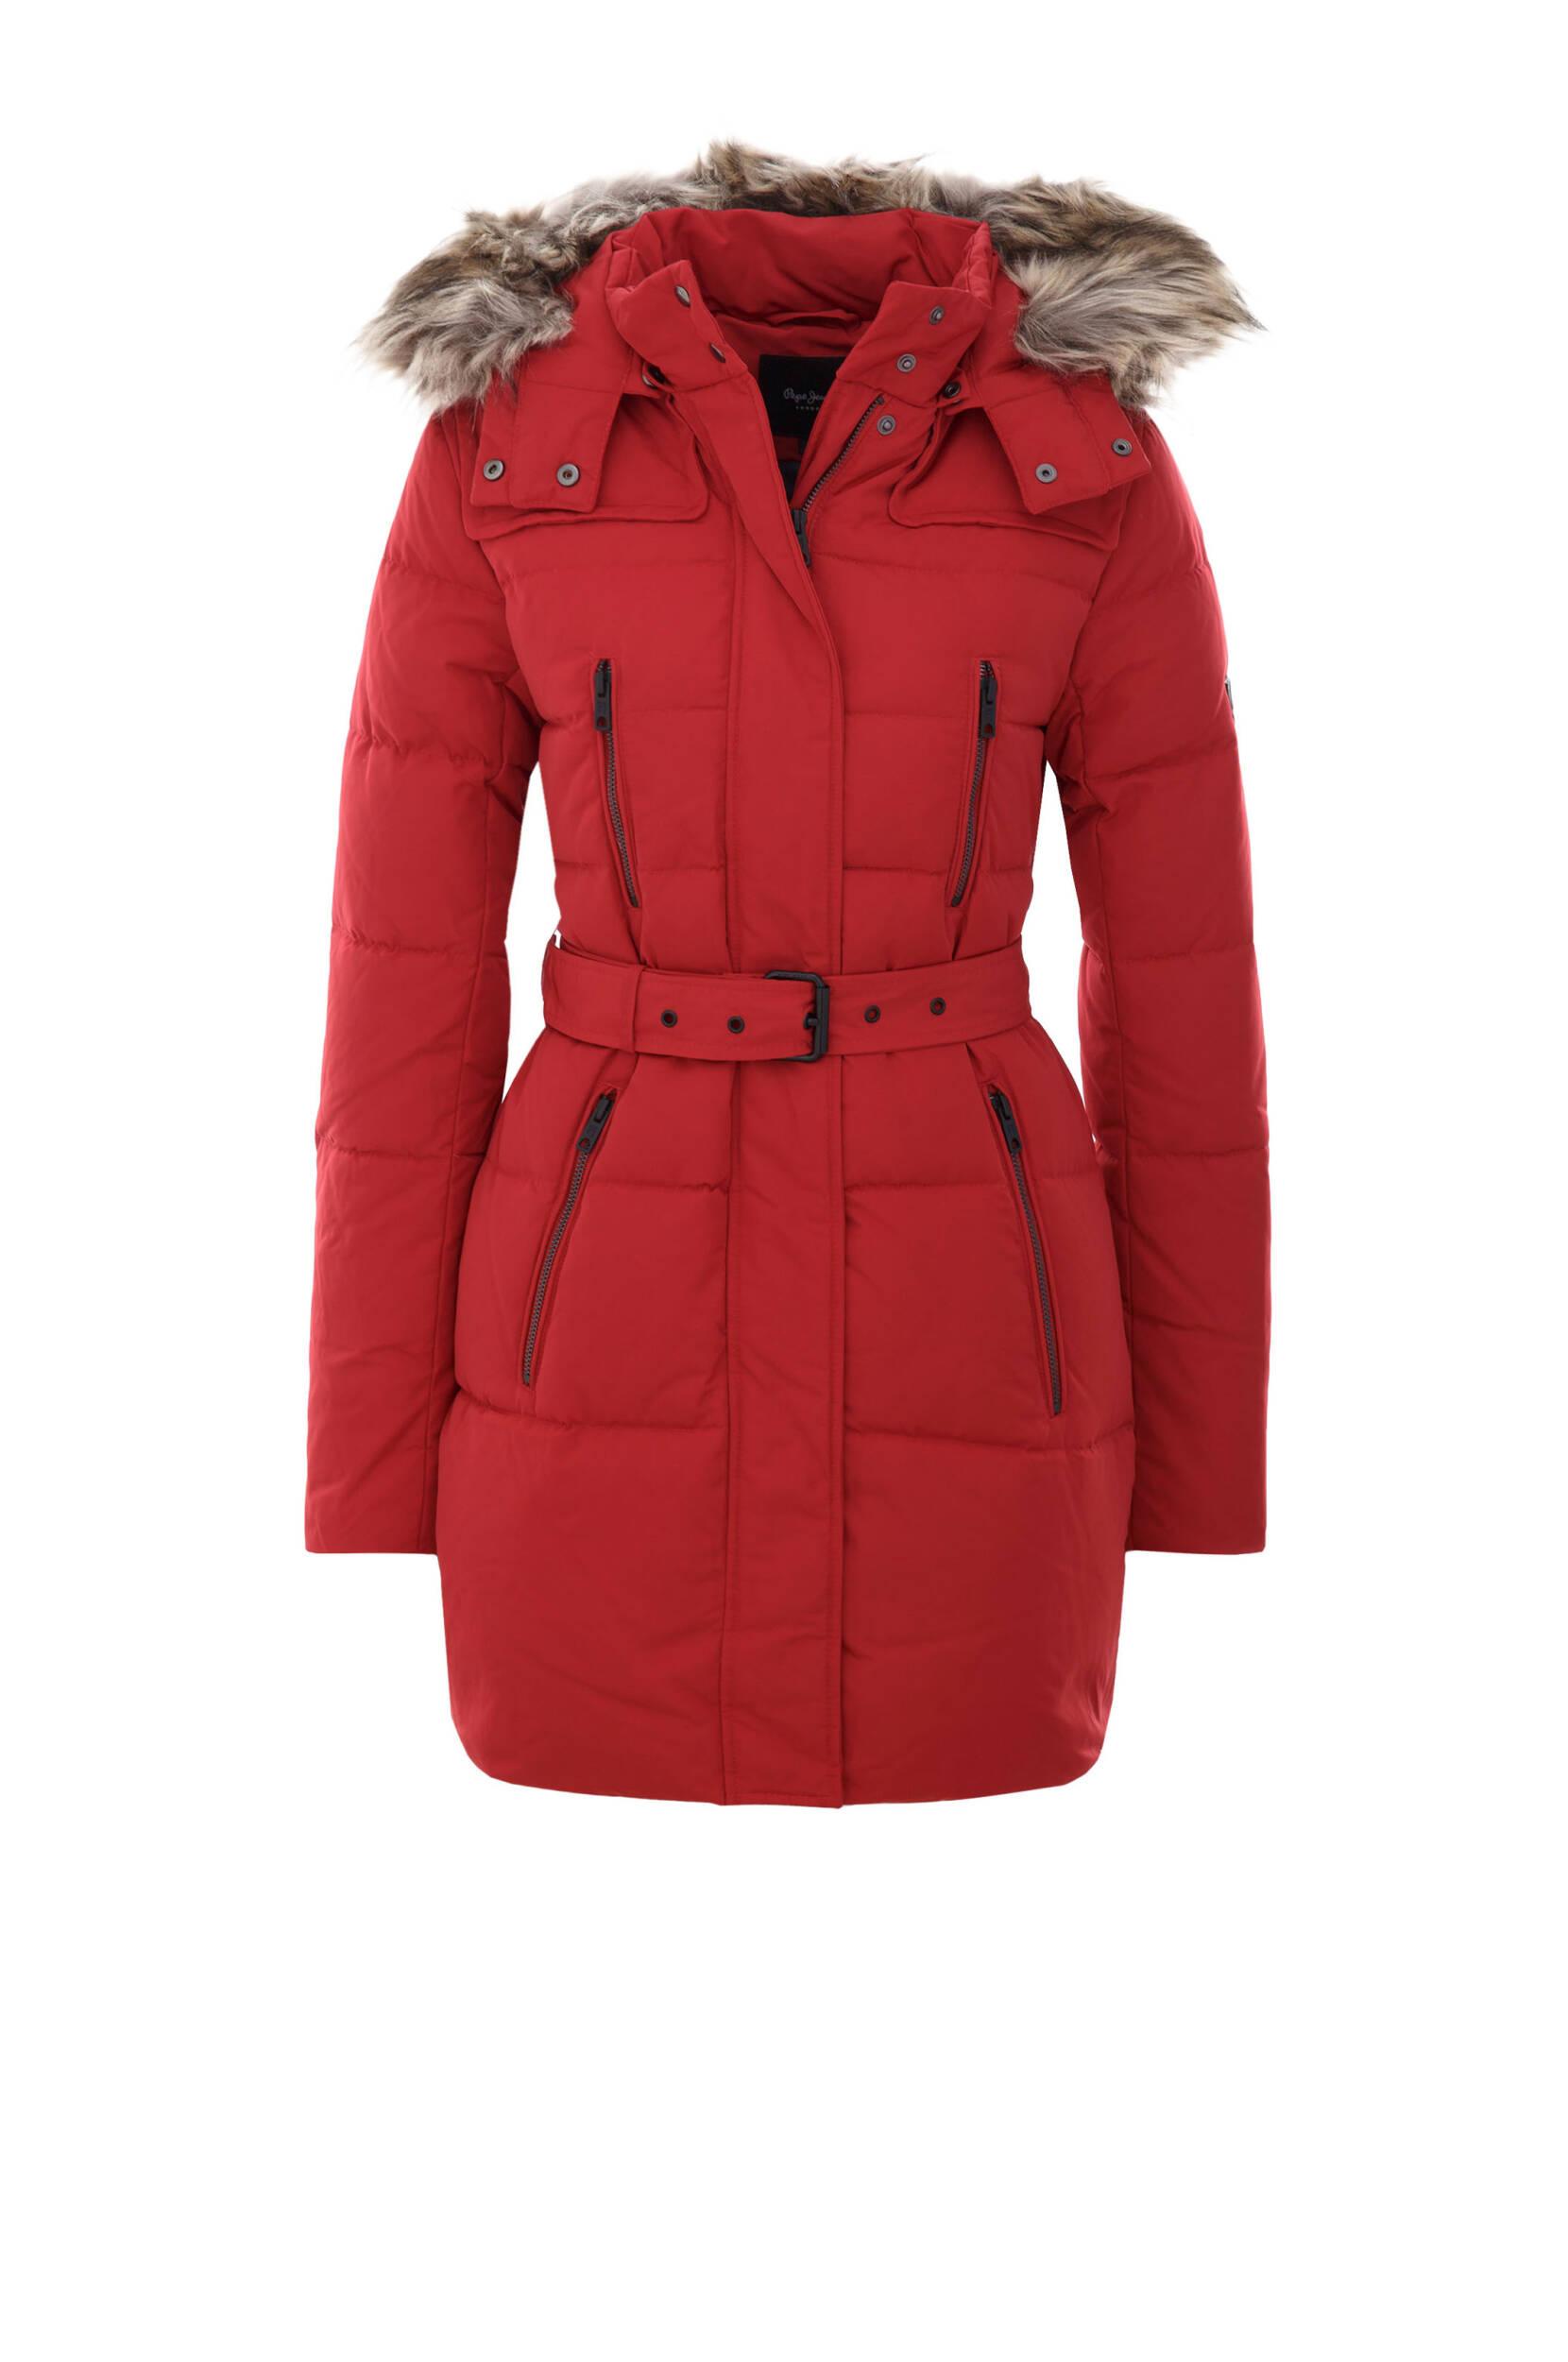 970fb568836fc Betties coat Pepe Jeans London   Red   Gomez.pl en